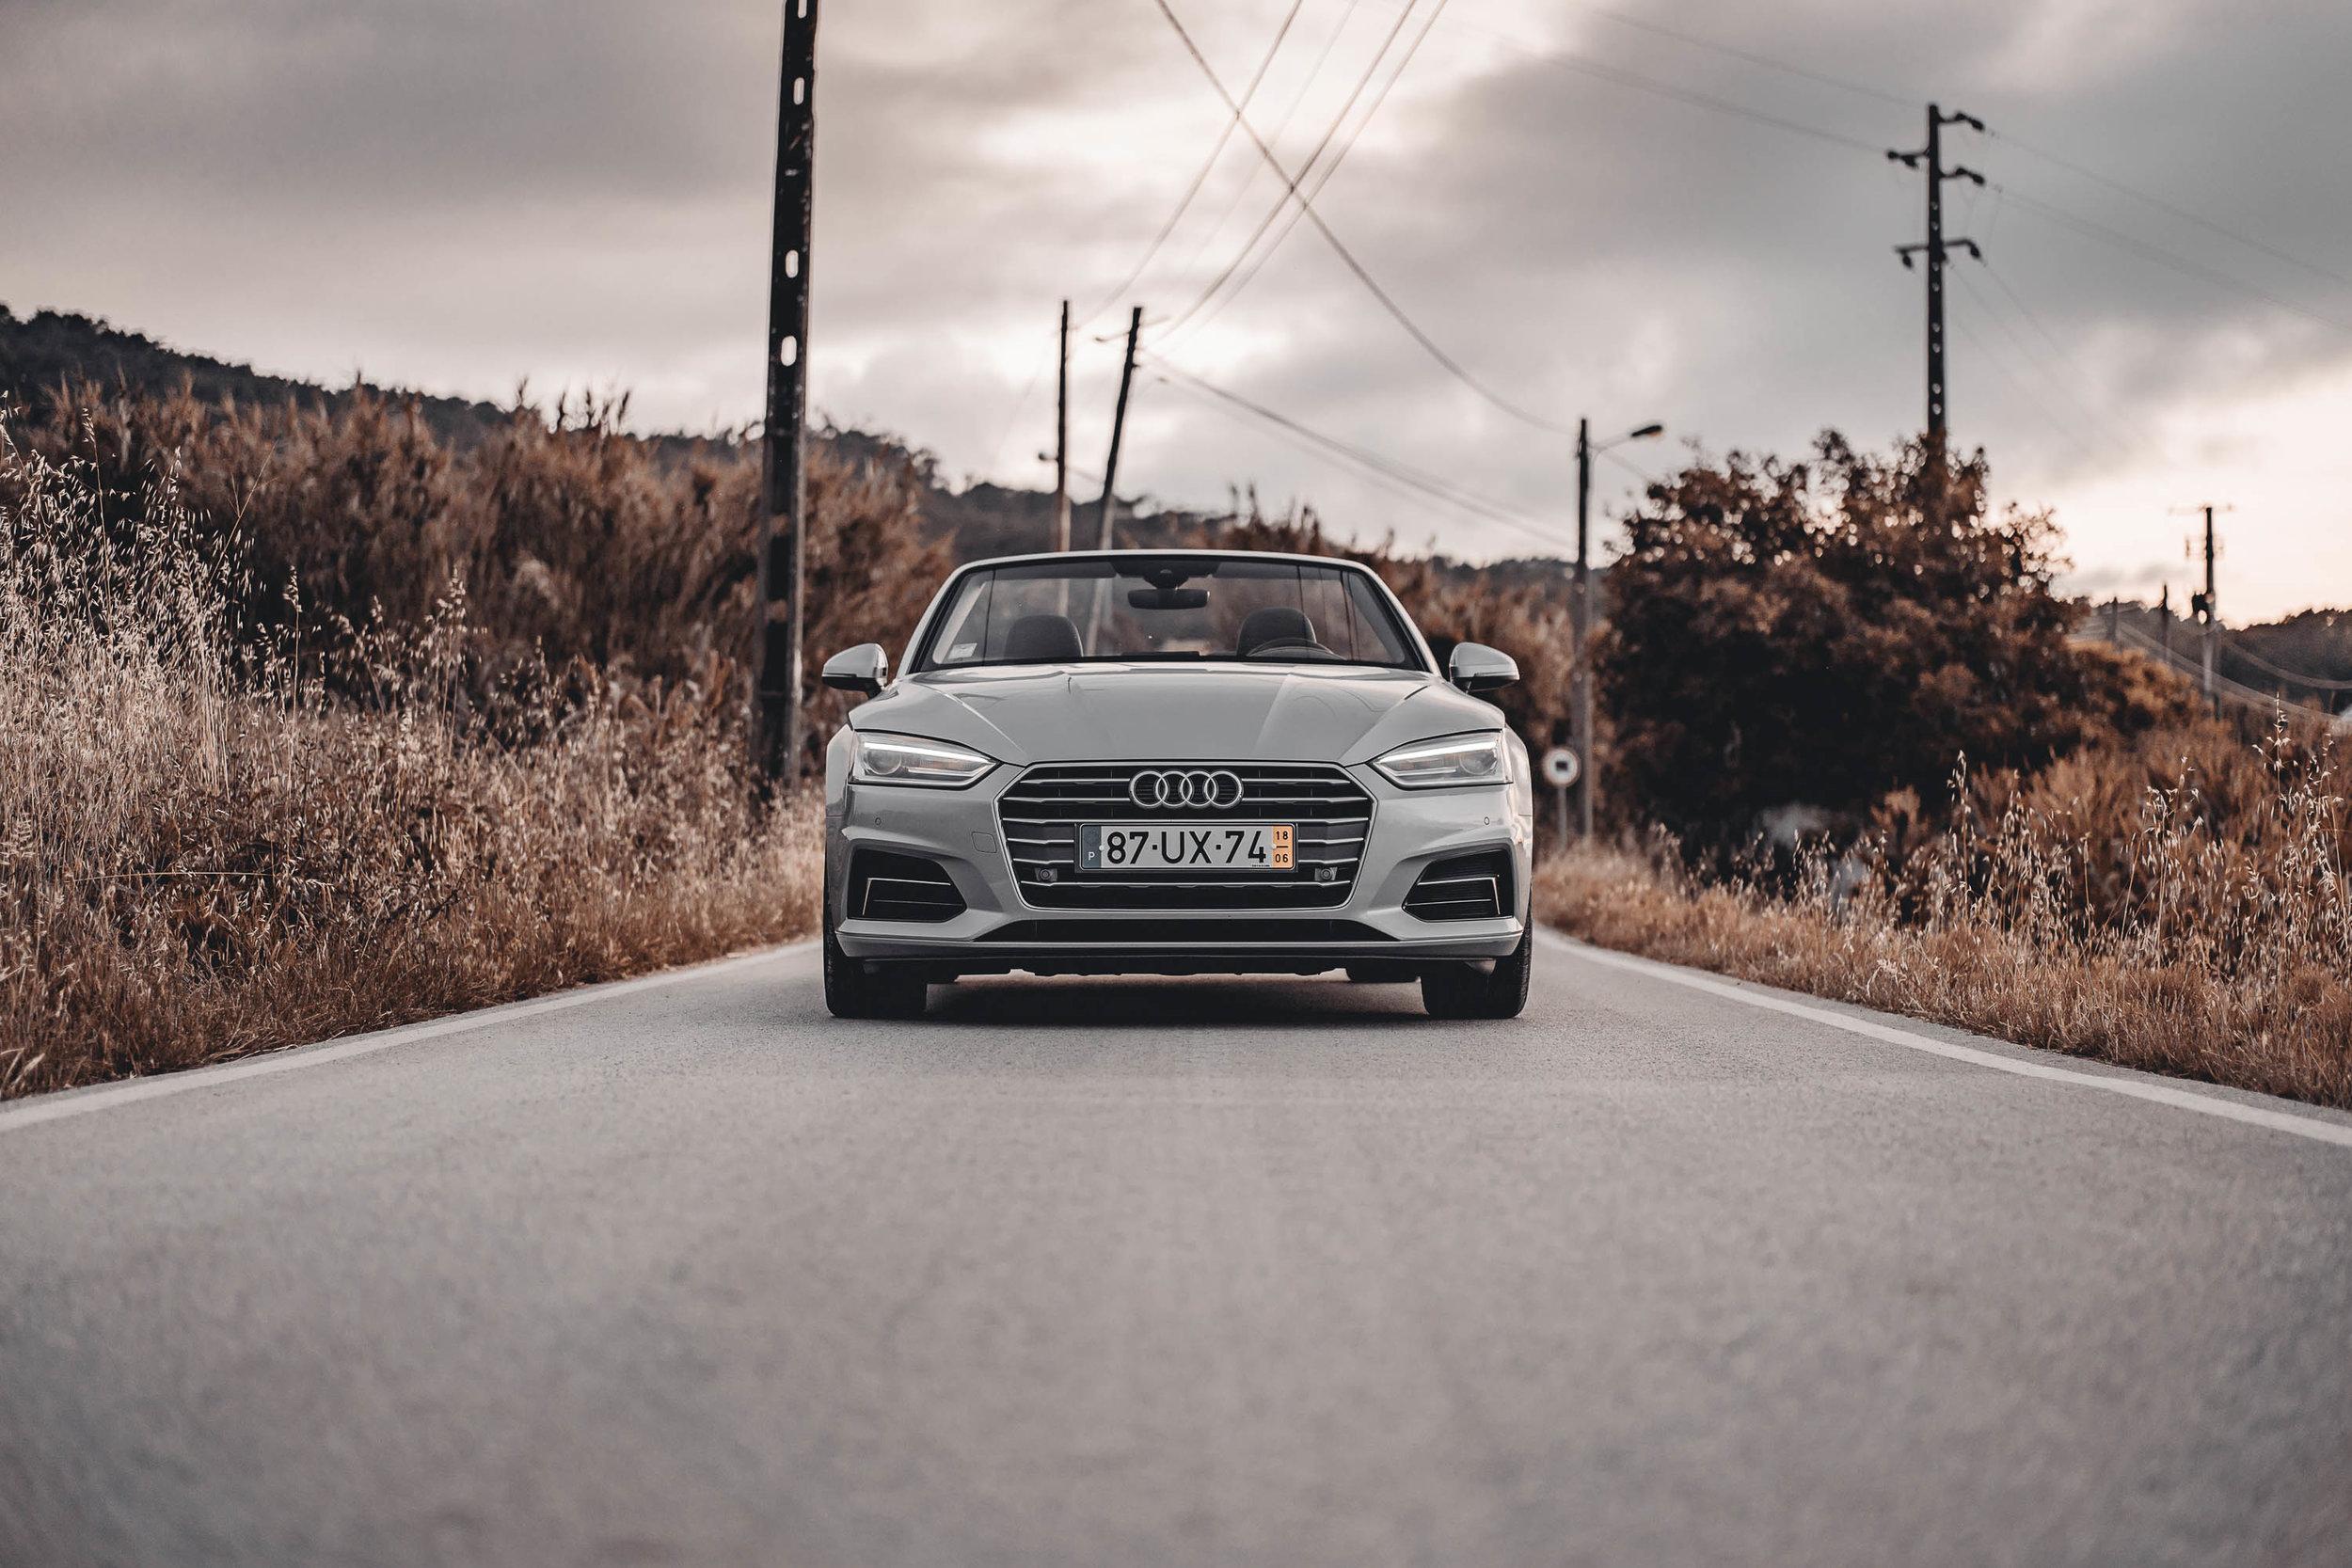 Maximilian_Otto_Audi_A5_Cabriolet_Portugal_18_WEB.jpg